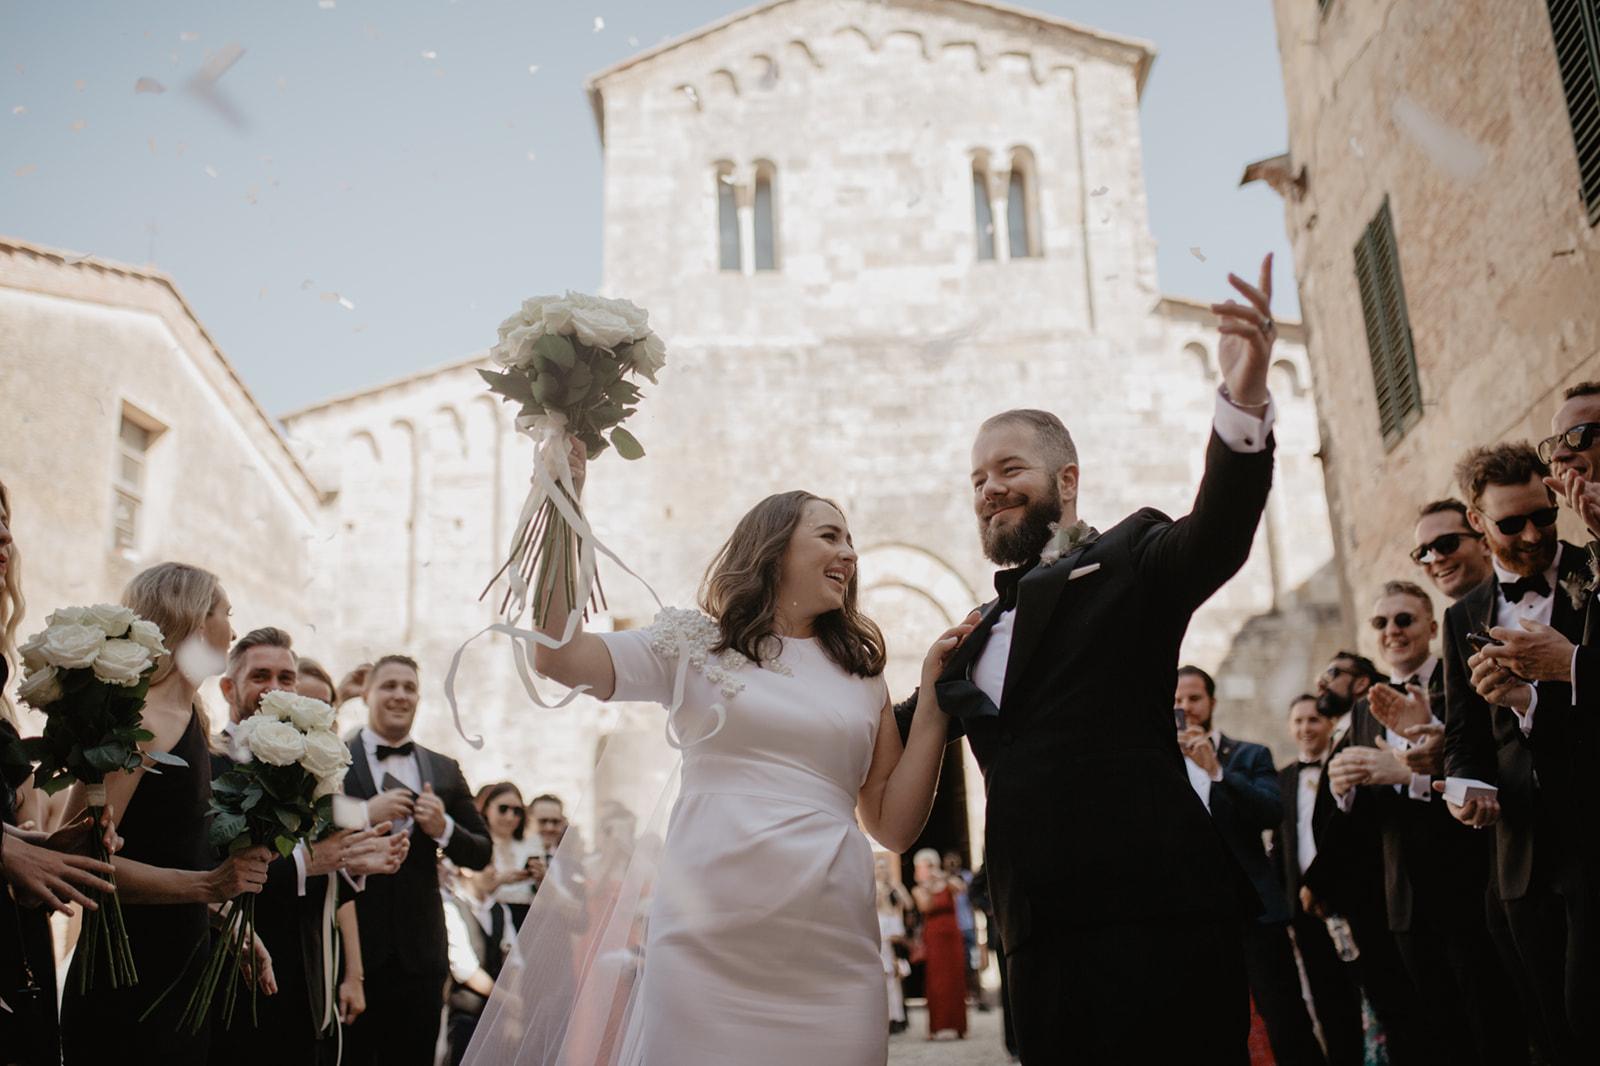 Renee & James | Wedding at Borgo Stomennano, Tuscany